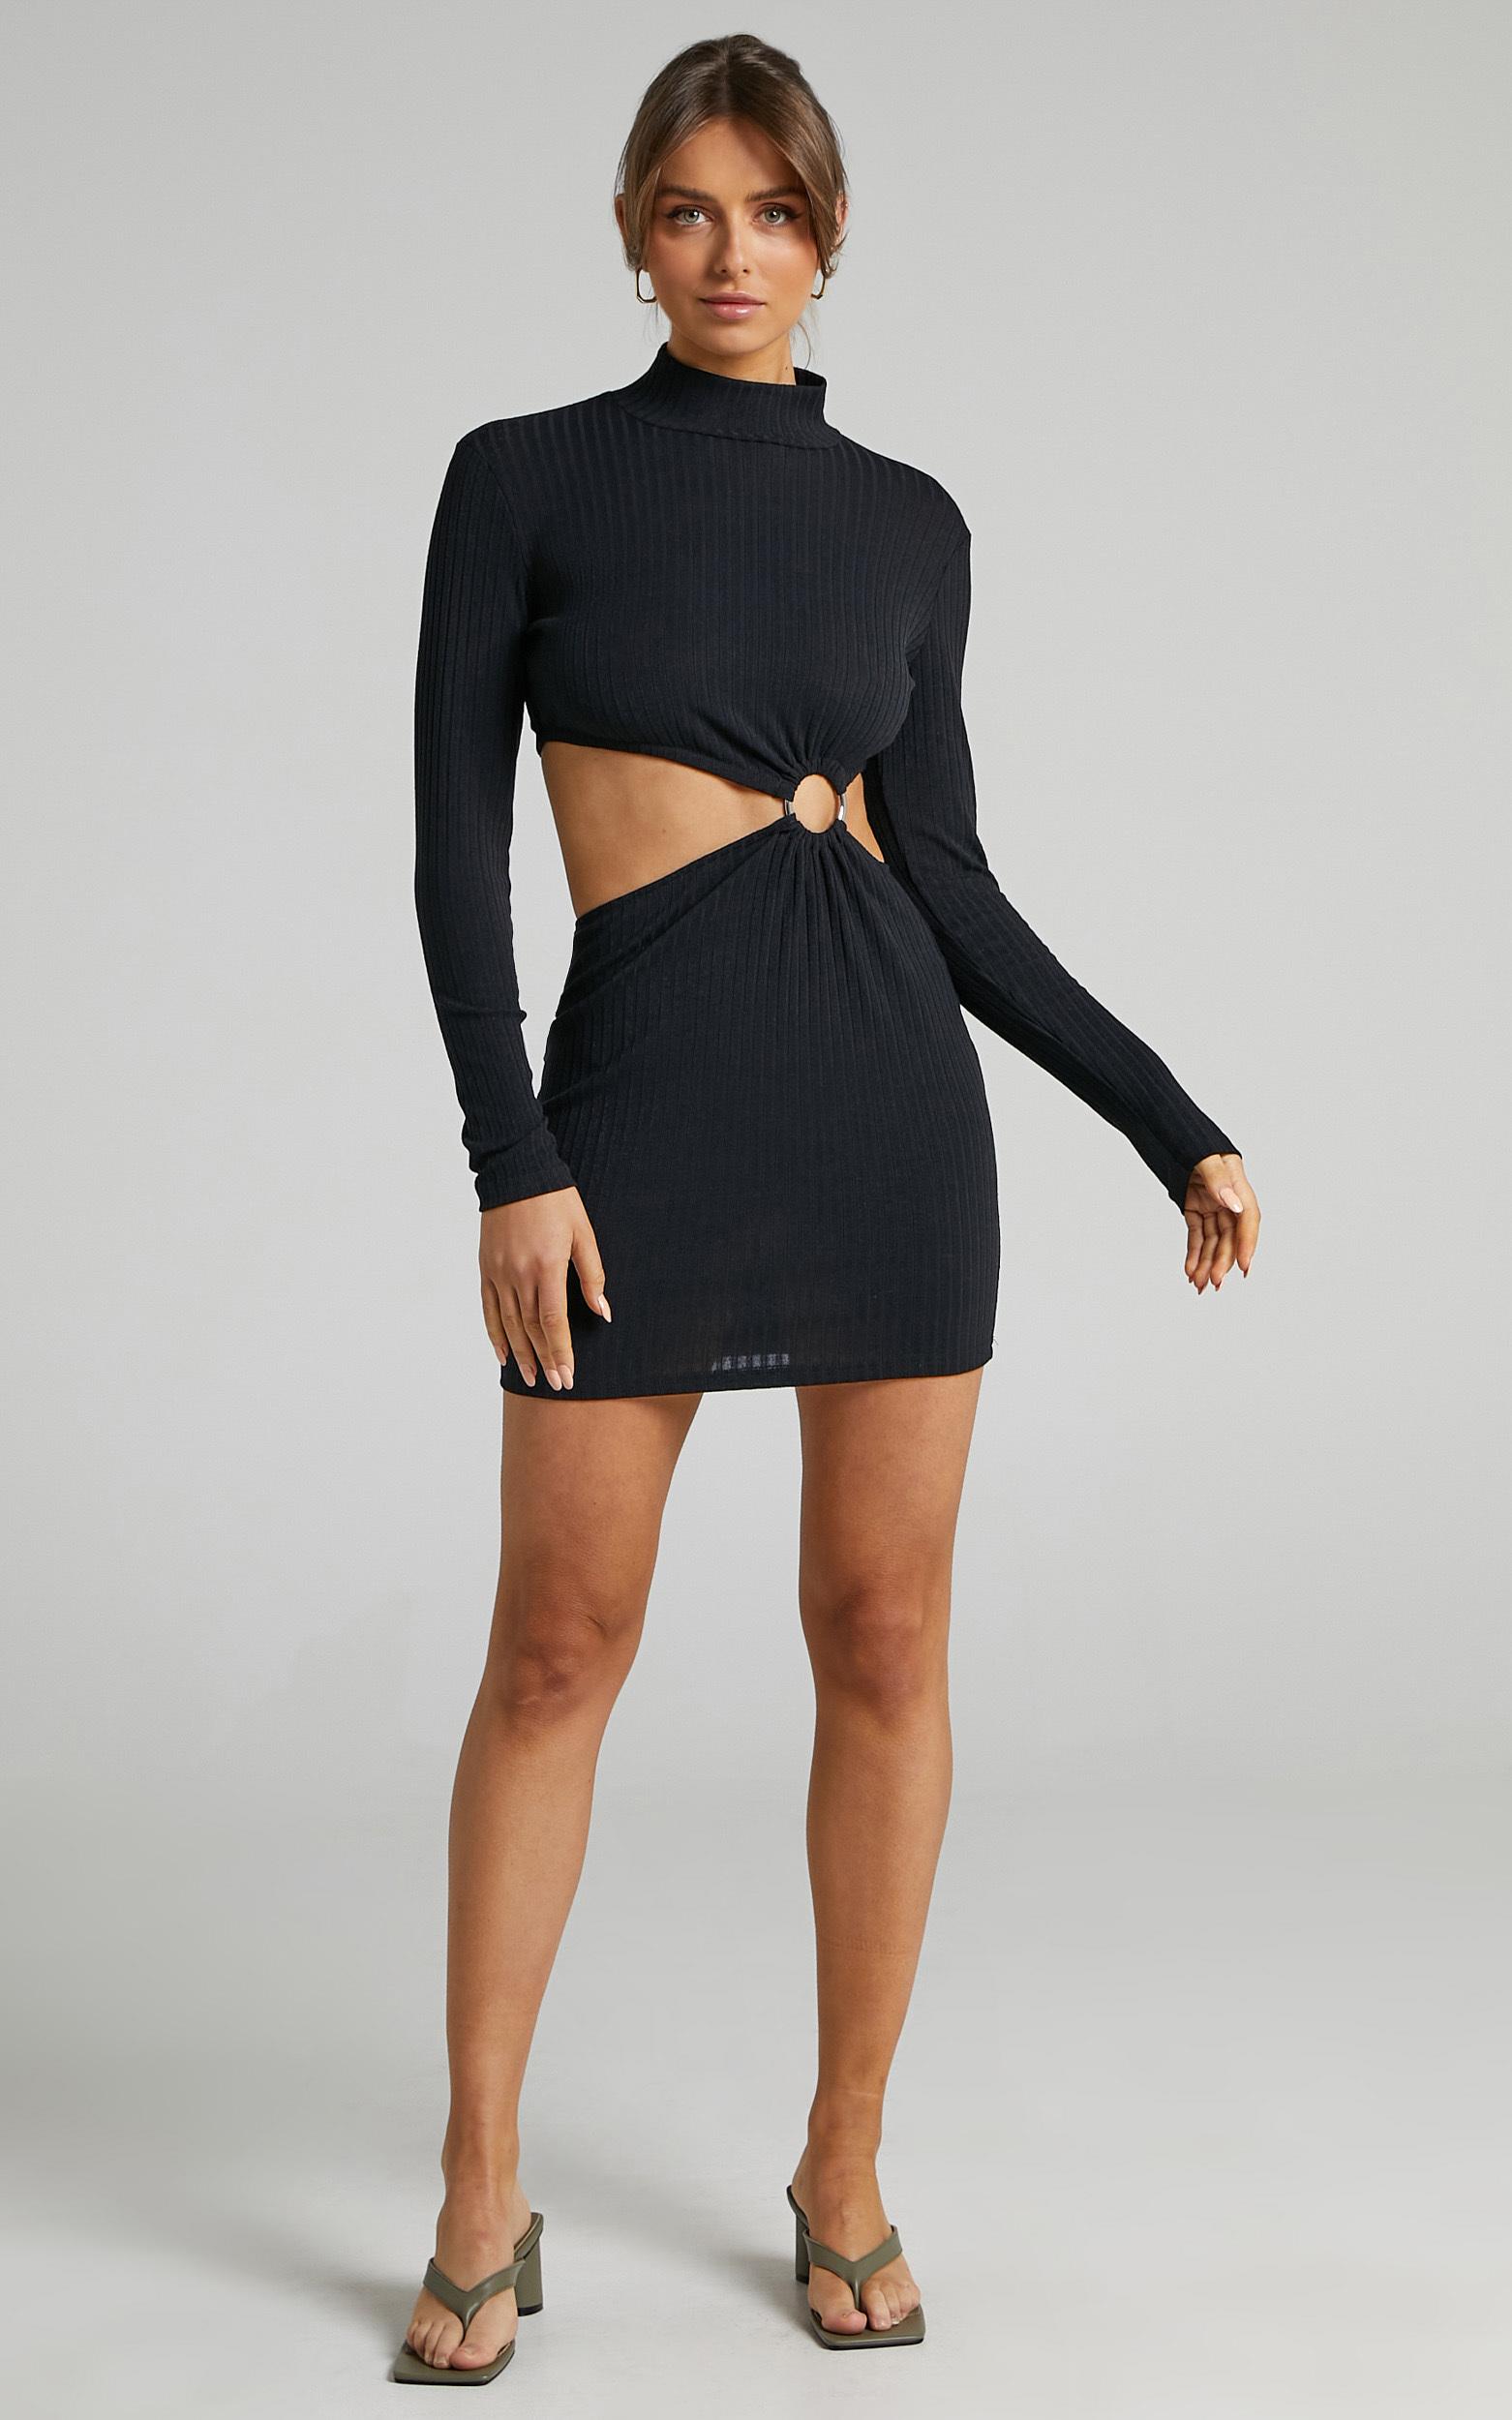 Binda Cut Out Long Sleeve Mini Dress in Black - 06, BLK1, hi-res image number null